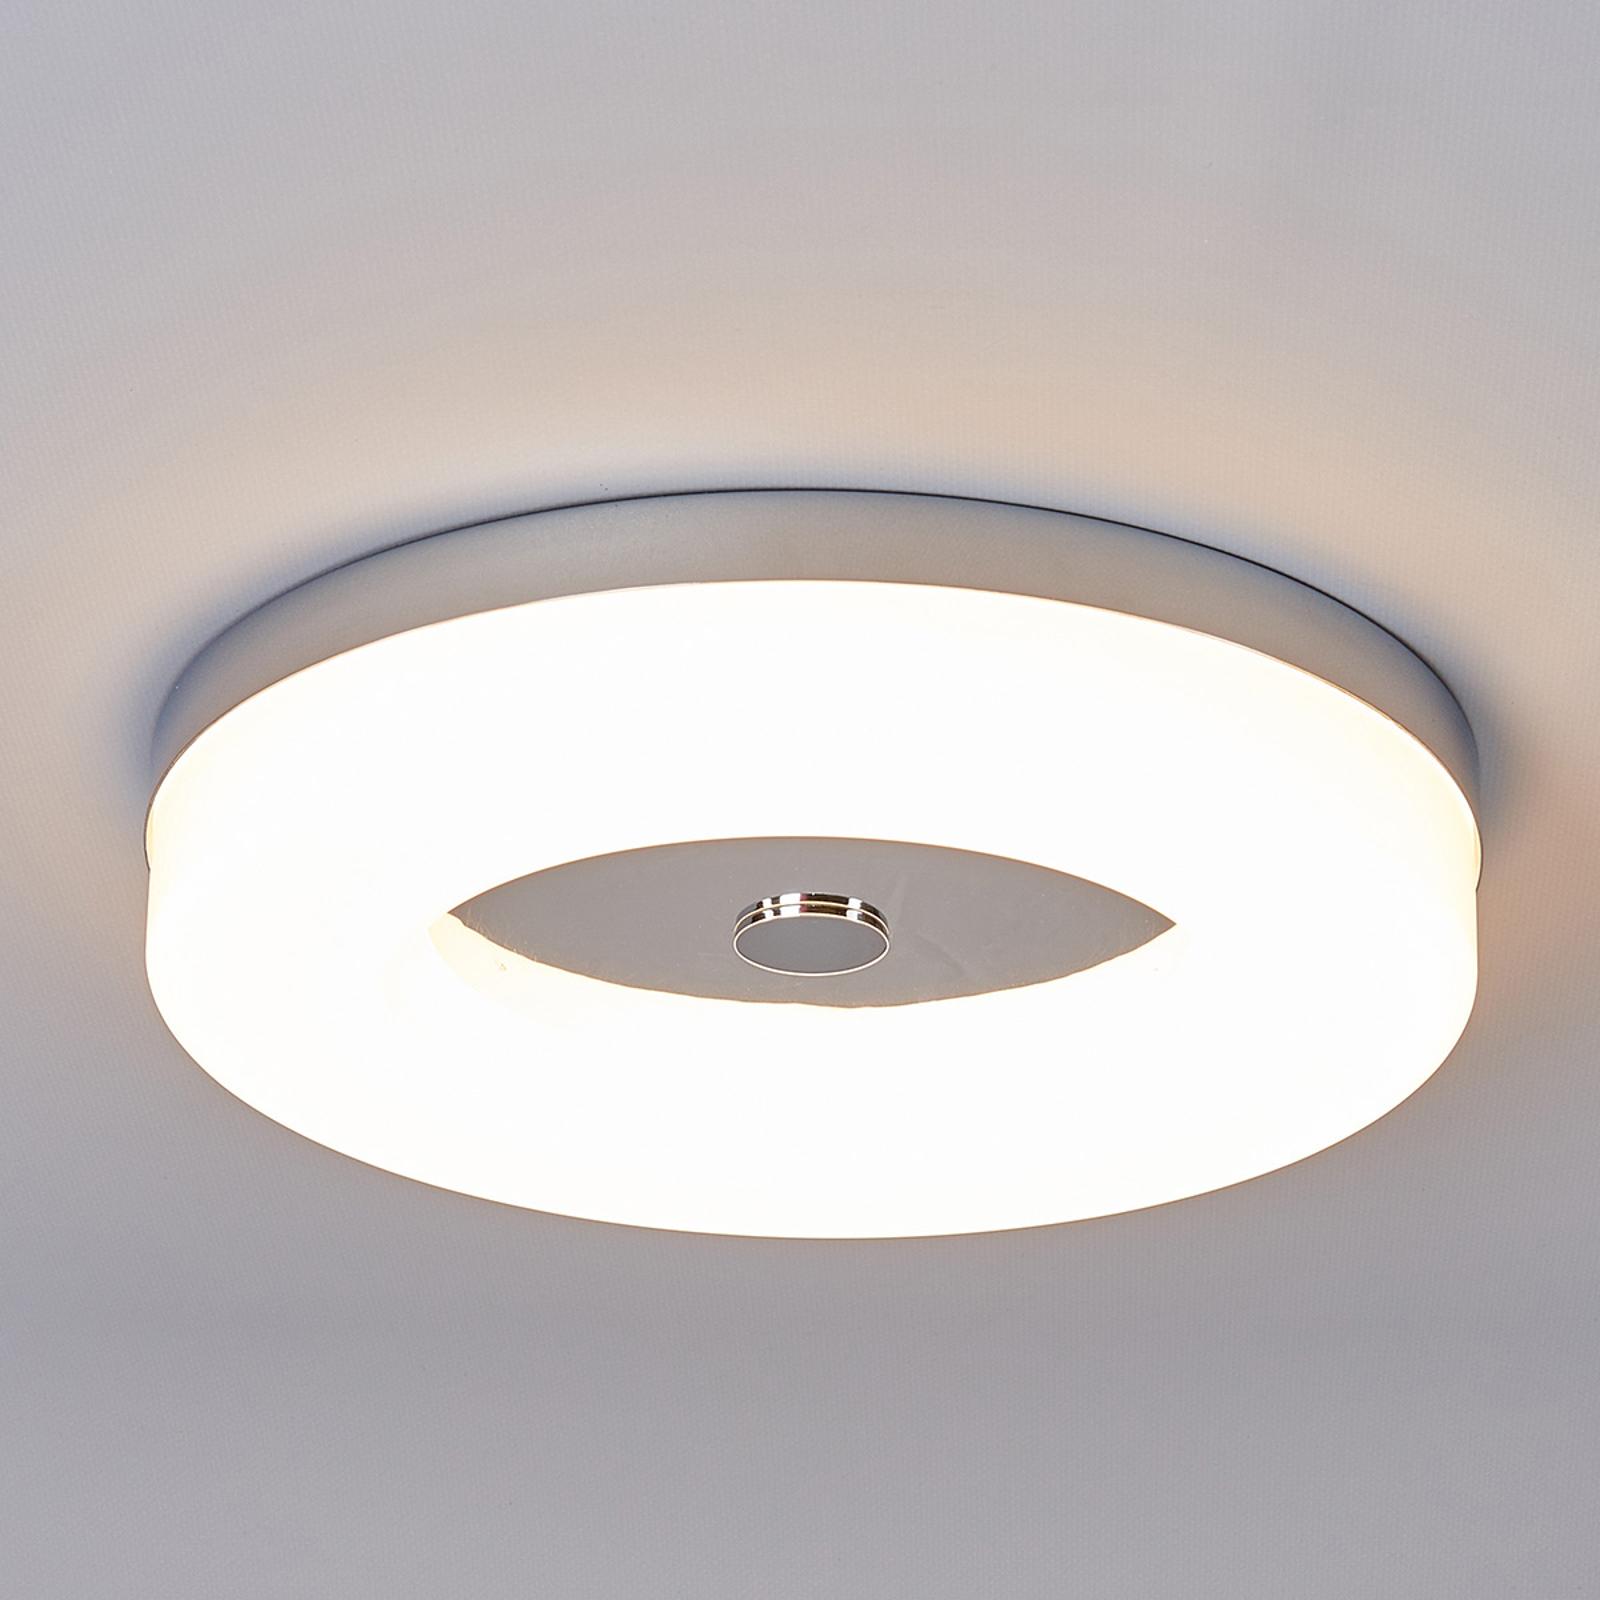 Plafonnier LED Shania en forme d'anneau